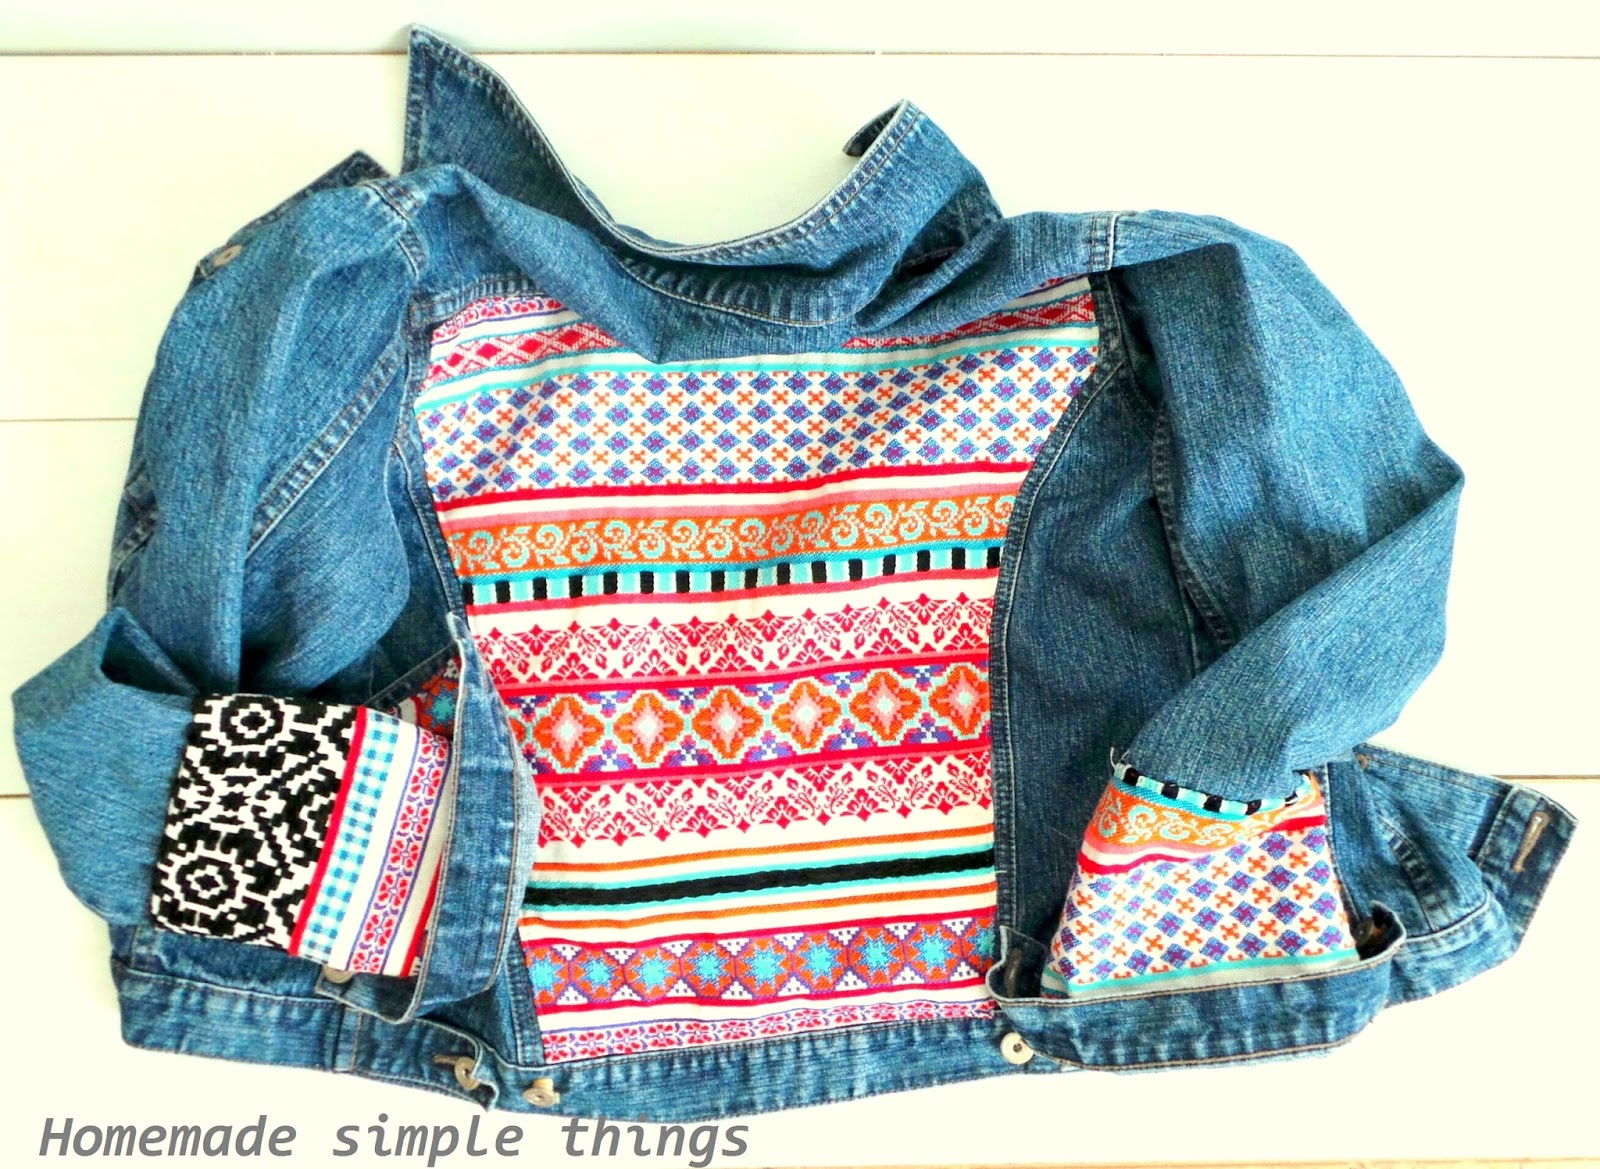 homemade simple things customiser une veste en jean avec un tissu thnique tuto customize a. Black Bedroom Furniture Sets. Home Design Ideas